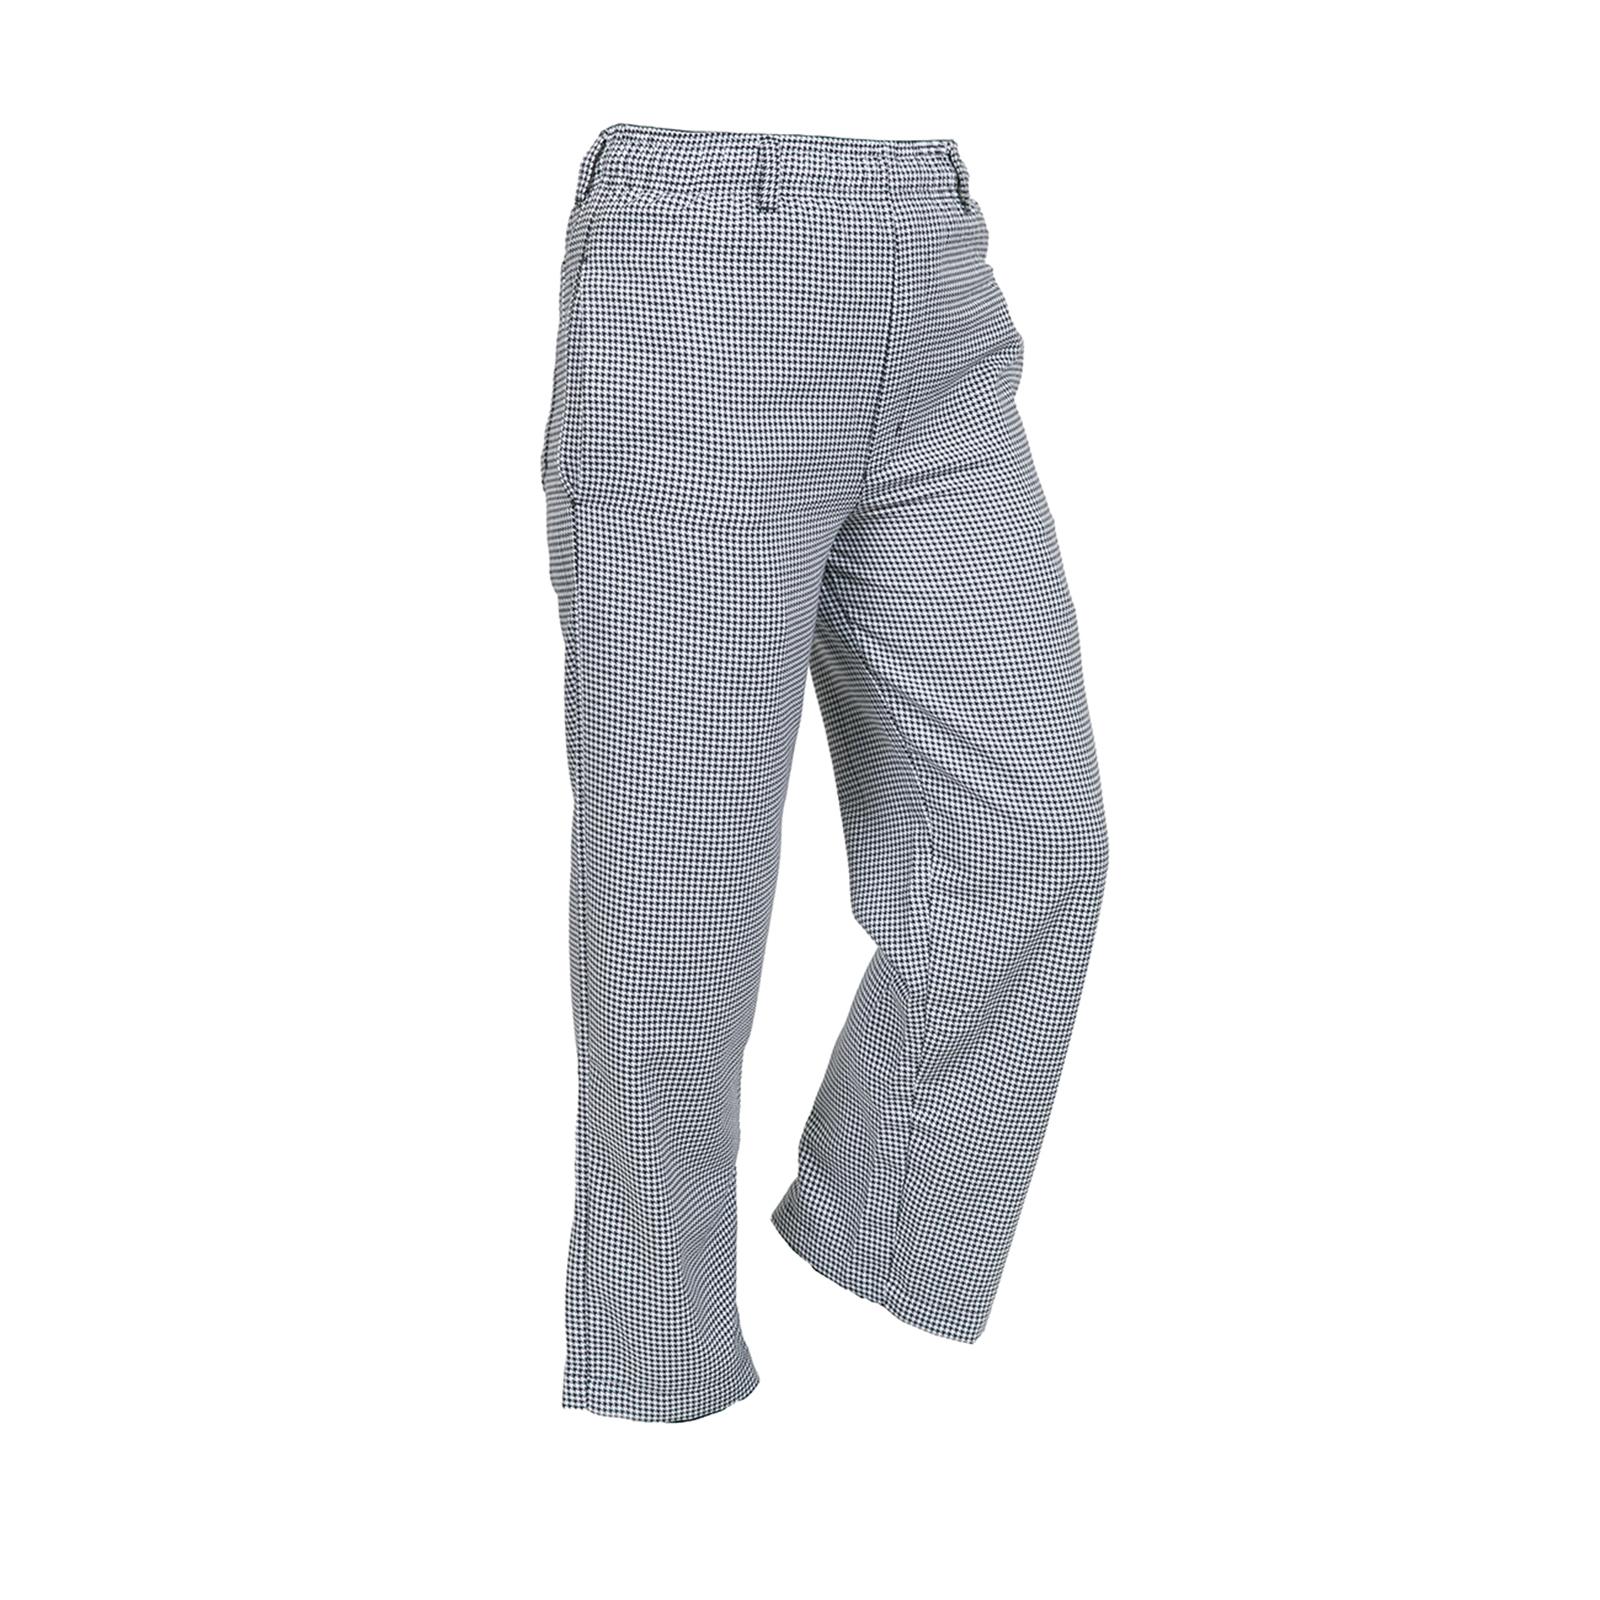 Mercer Culinary M60030HT6X chef's pants